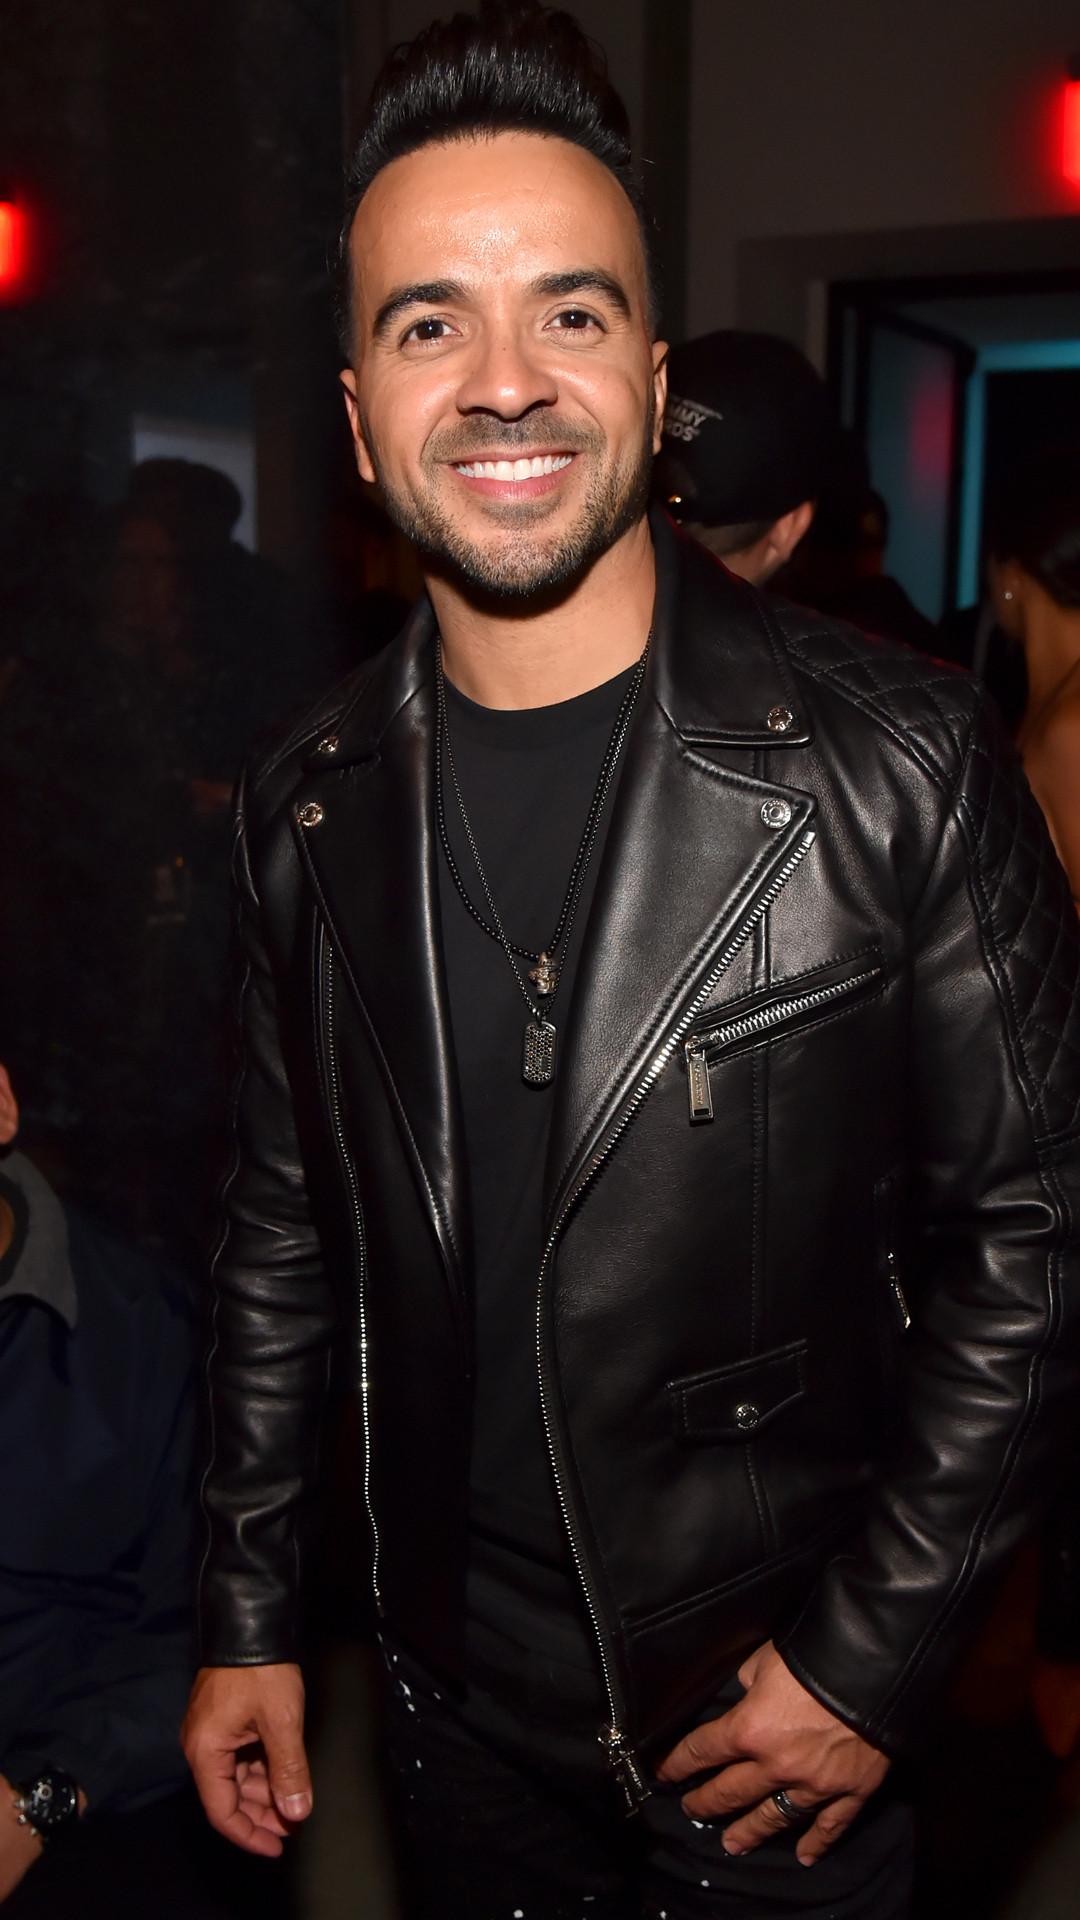 Luis Fonsi, 2018 Grammy Awards, Party Pics